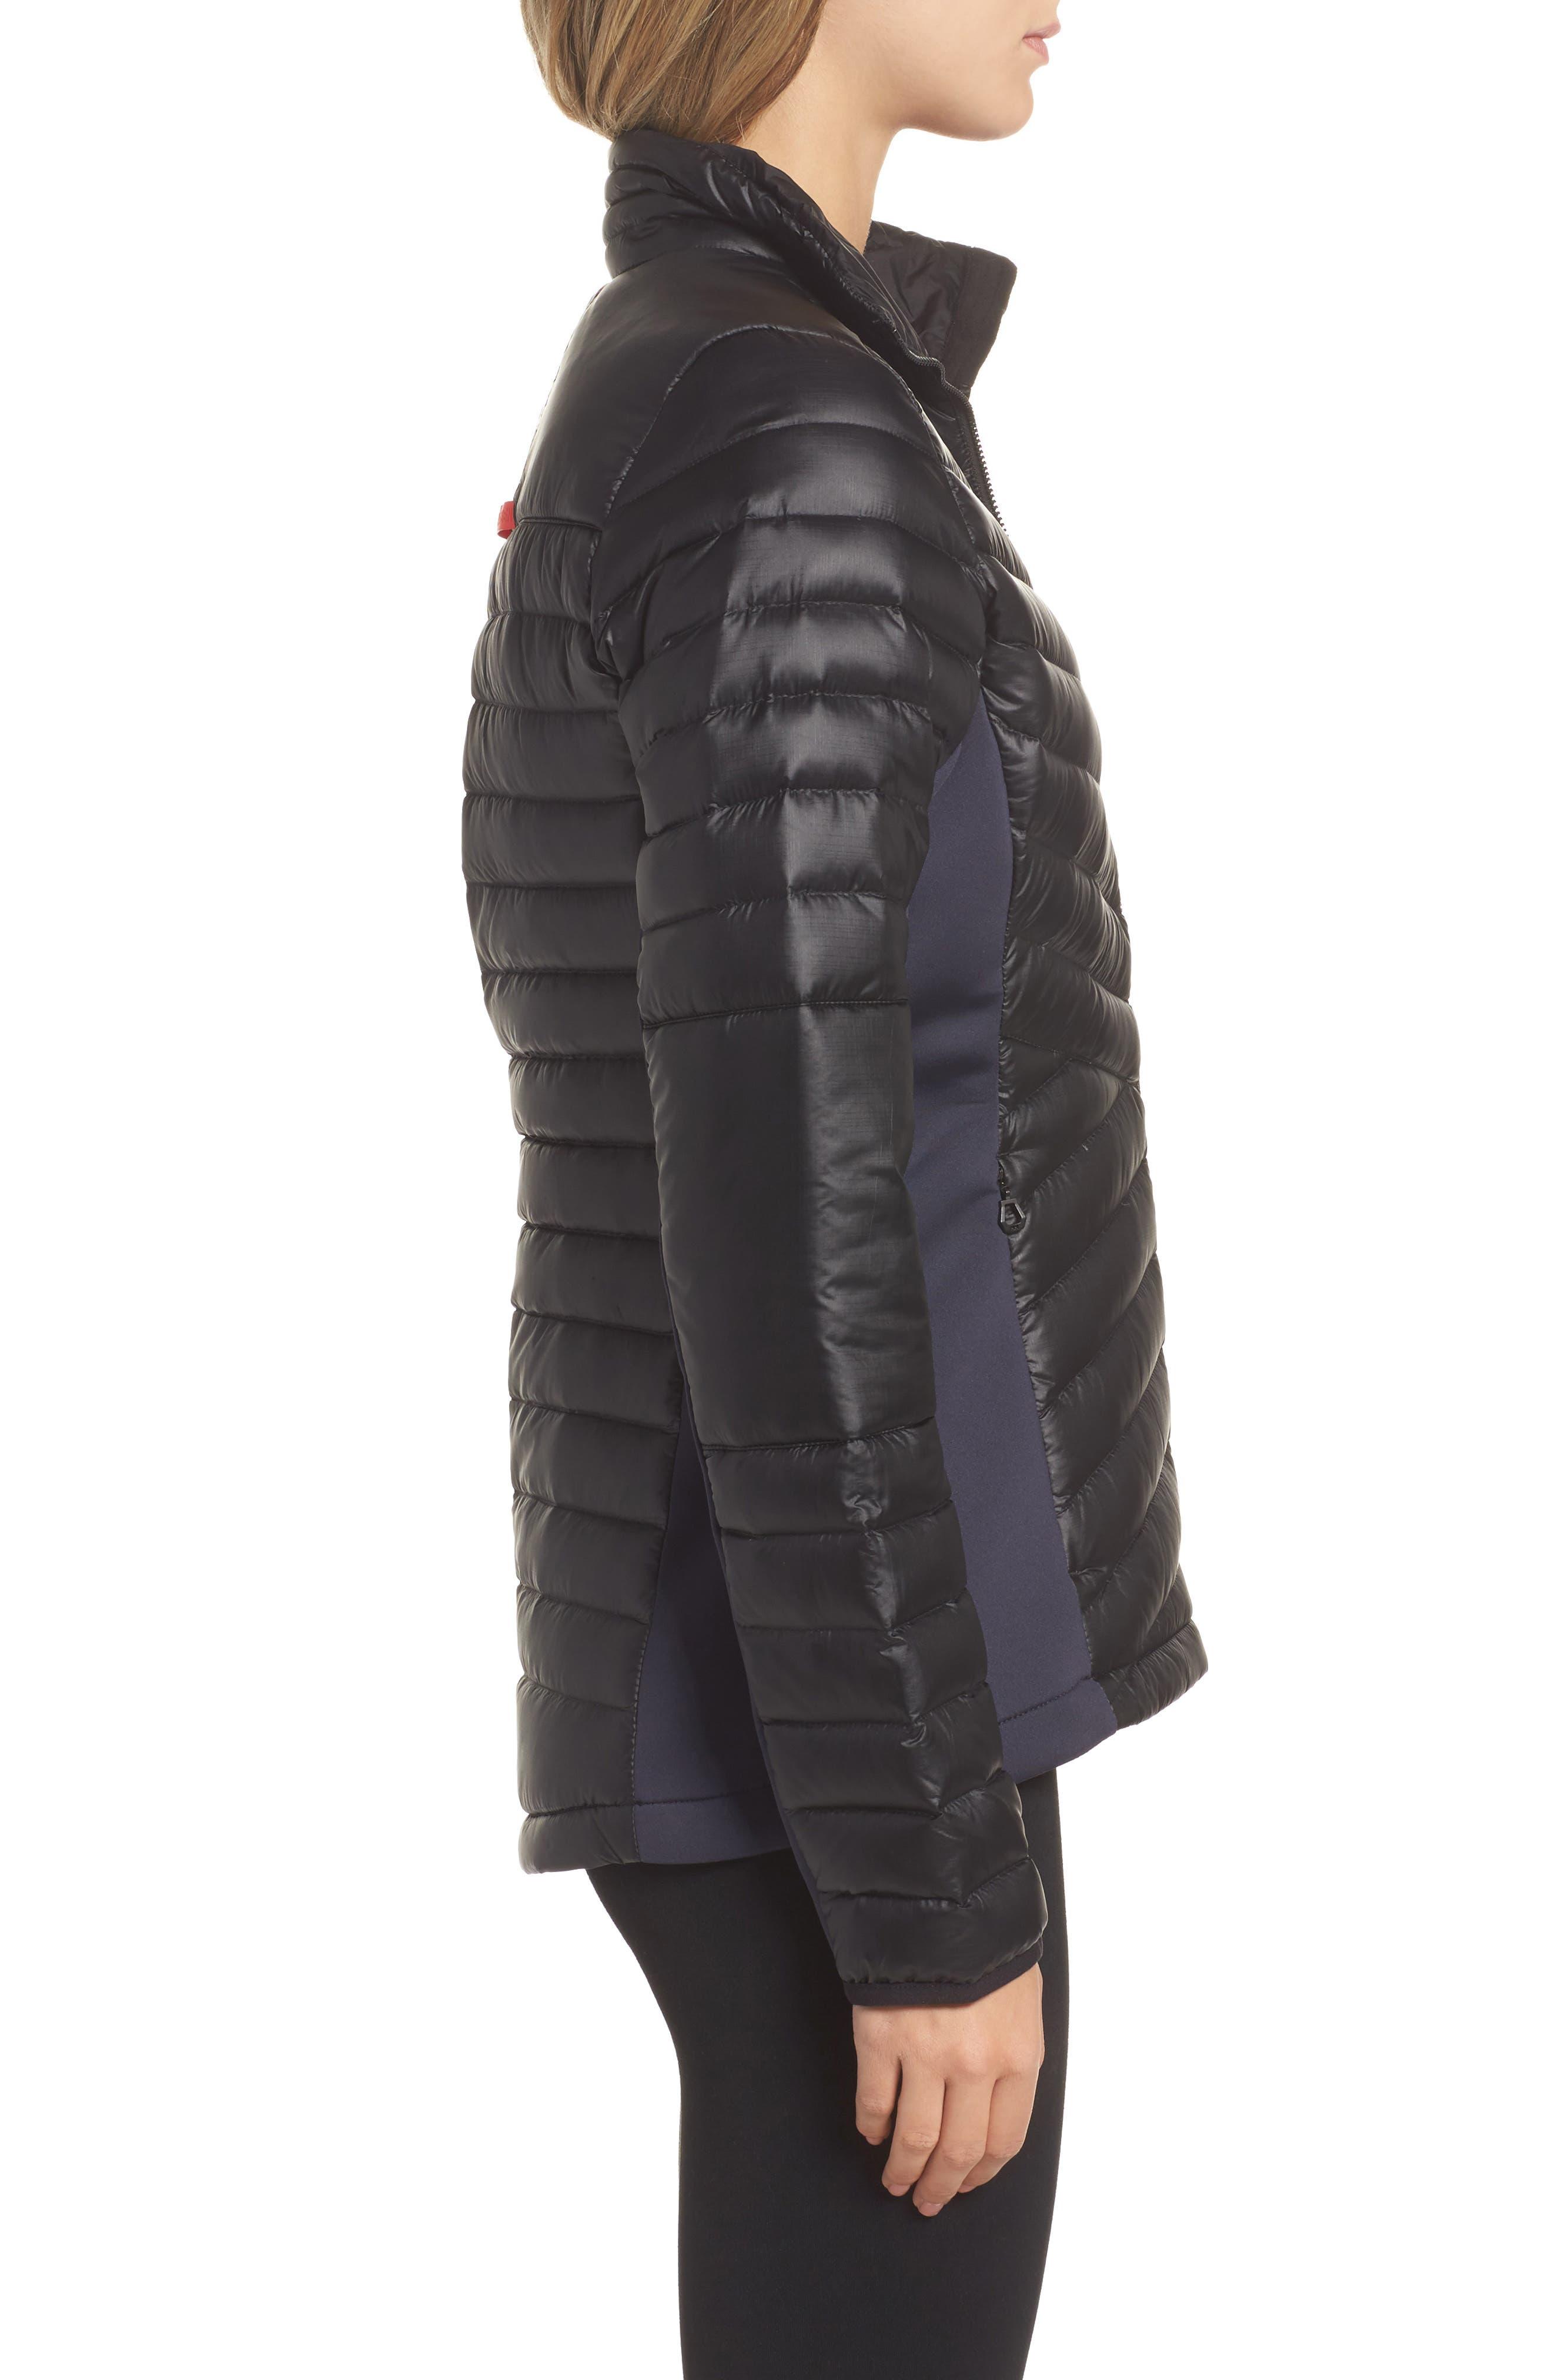 Verglas Hybrid Down Insulator Jacket,                             Alternate thumbnail 3, color,                             001